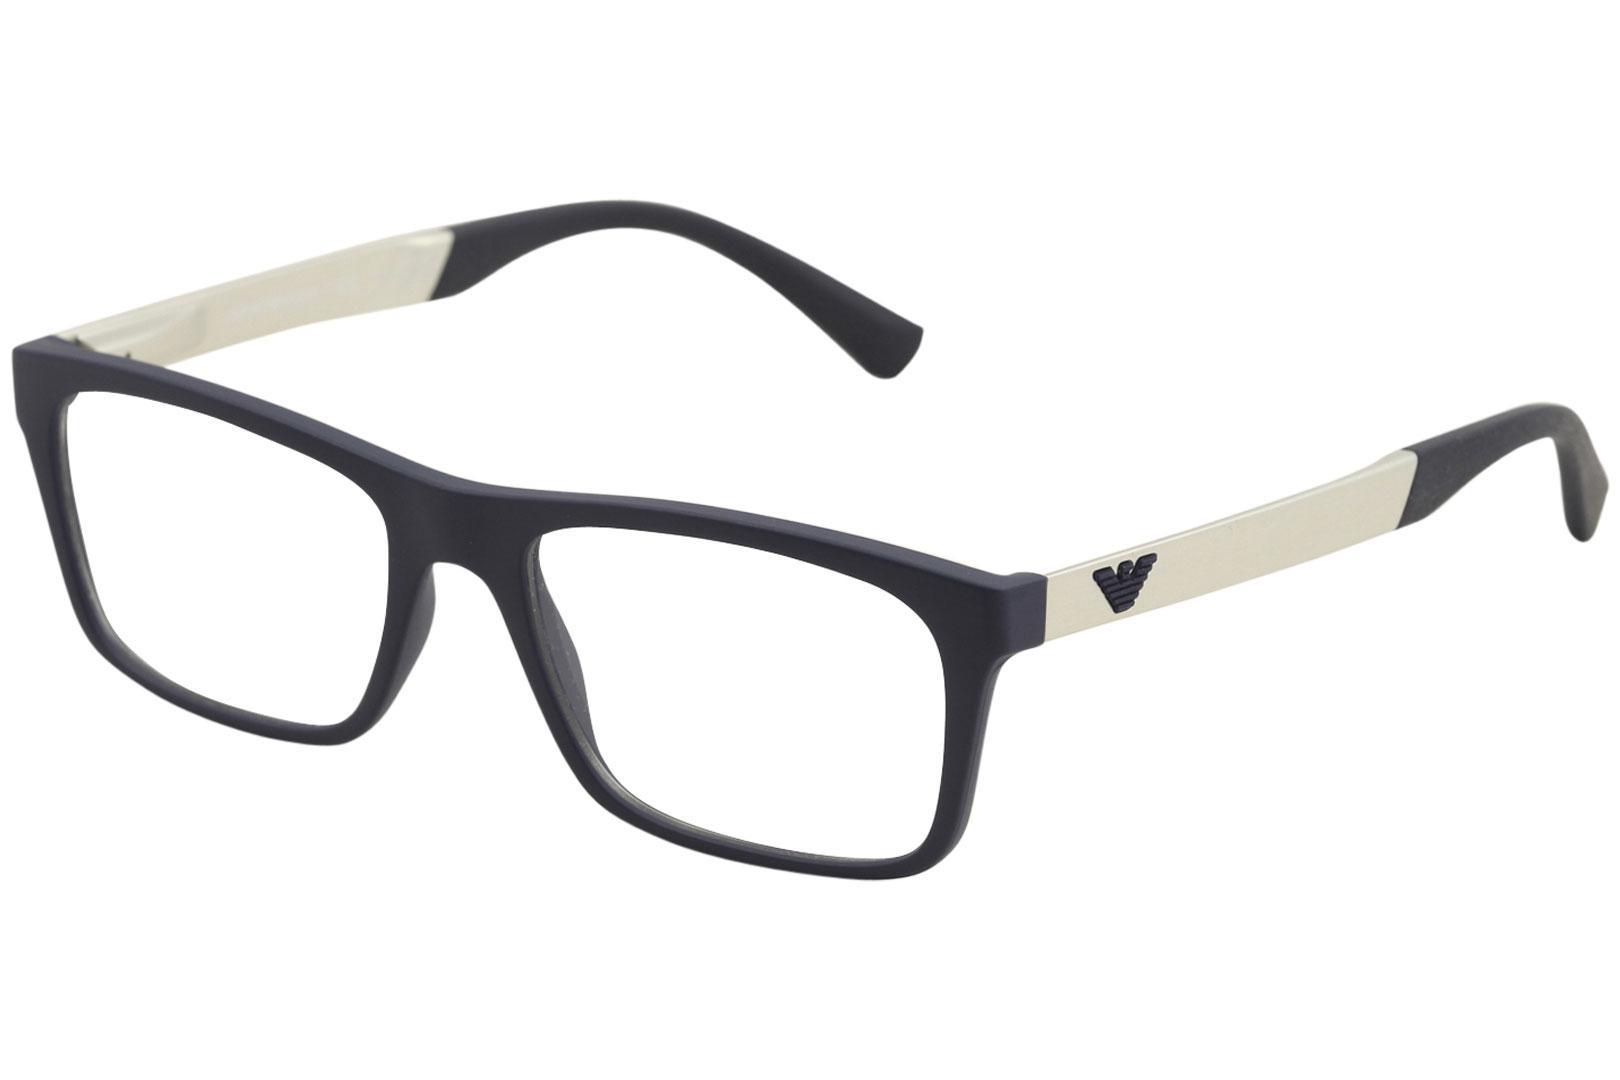 edcb2188c47 Emporio Armani Men s Eyeglasses EA3101 EA 3101 Full Rim Optical Frame